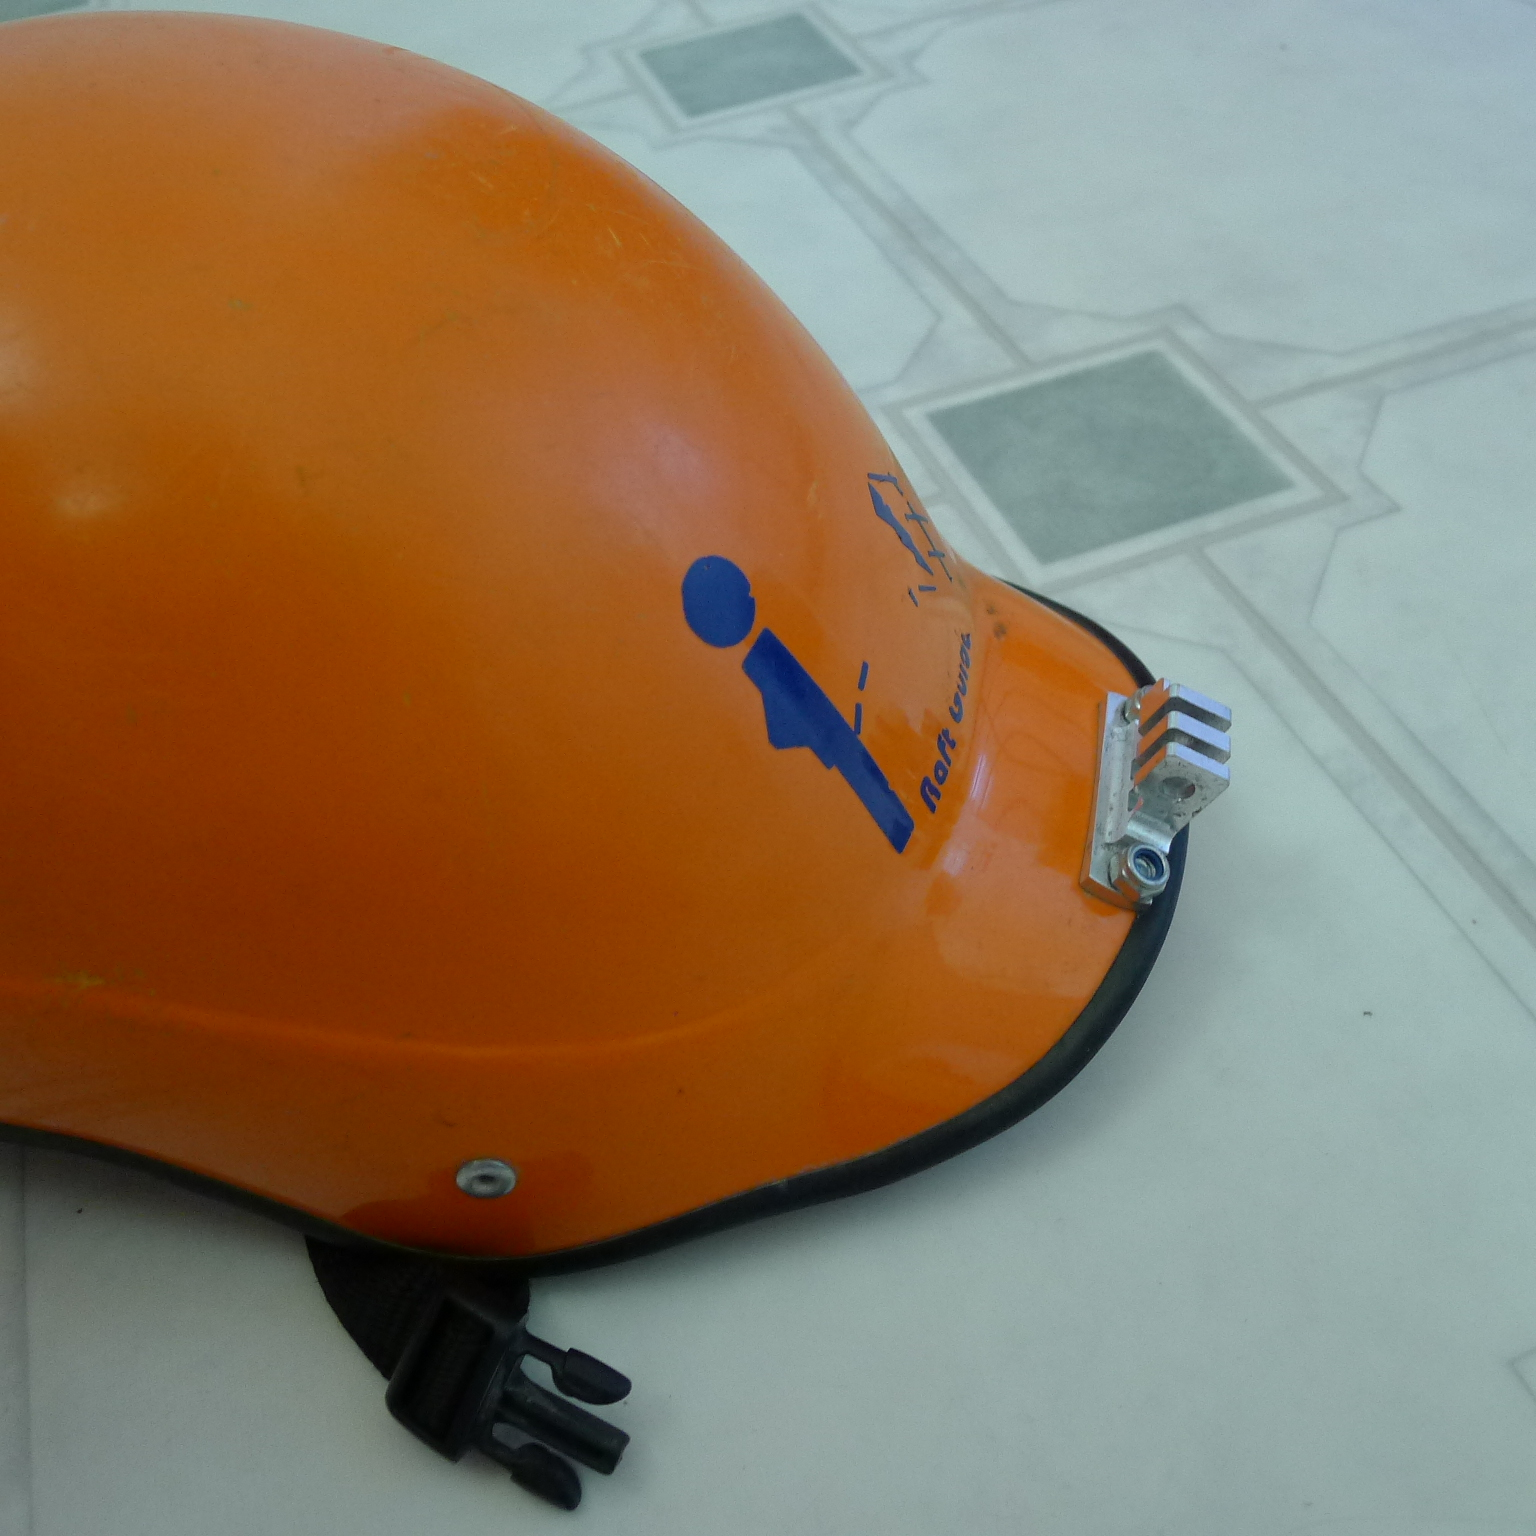 Click image for larger version  Name:Go Pro Helmet Mount side.JPG Views:130 Size:916.5 KB ID:3147